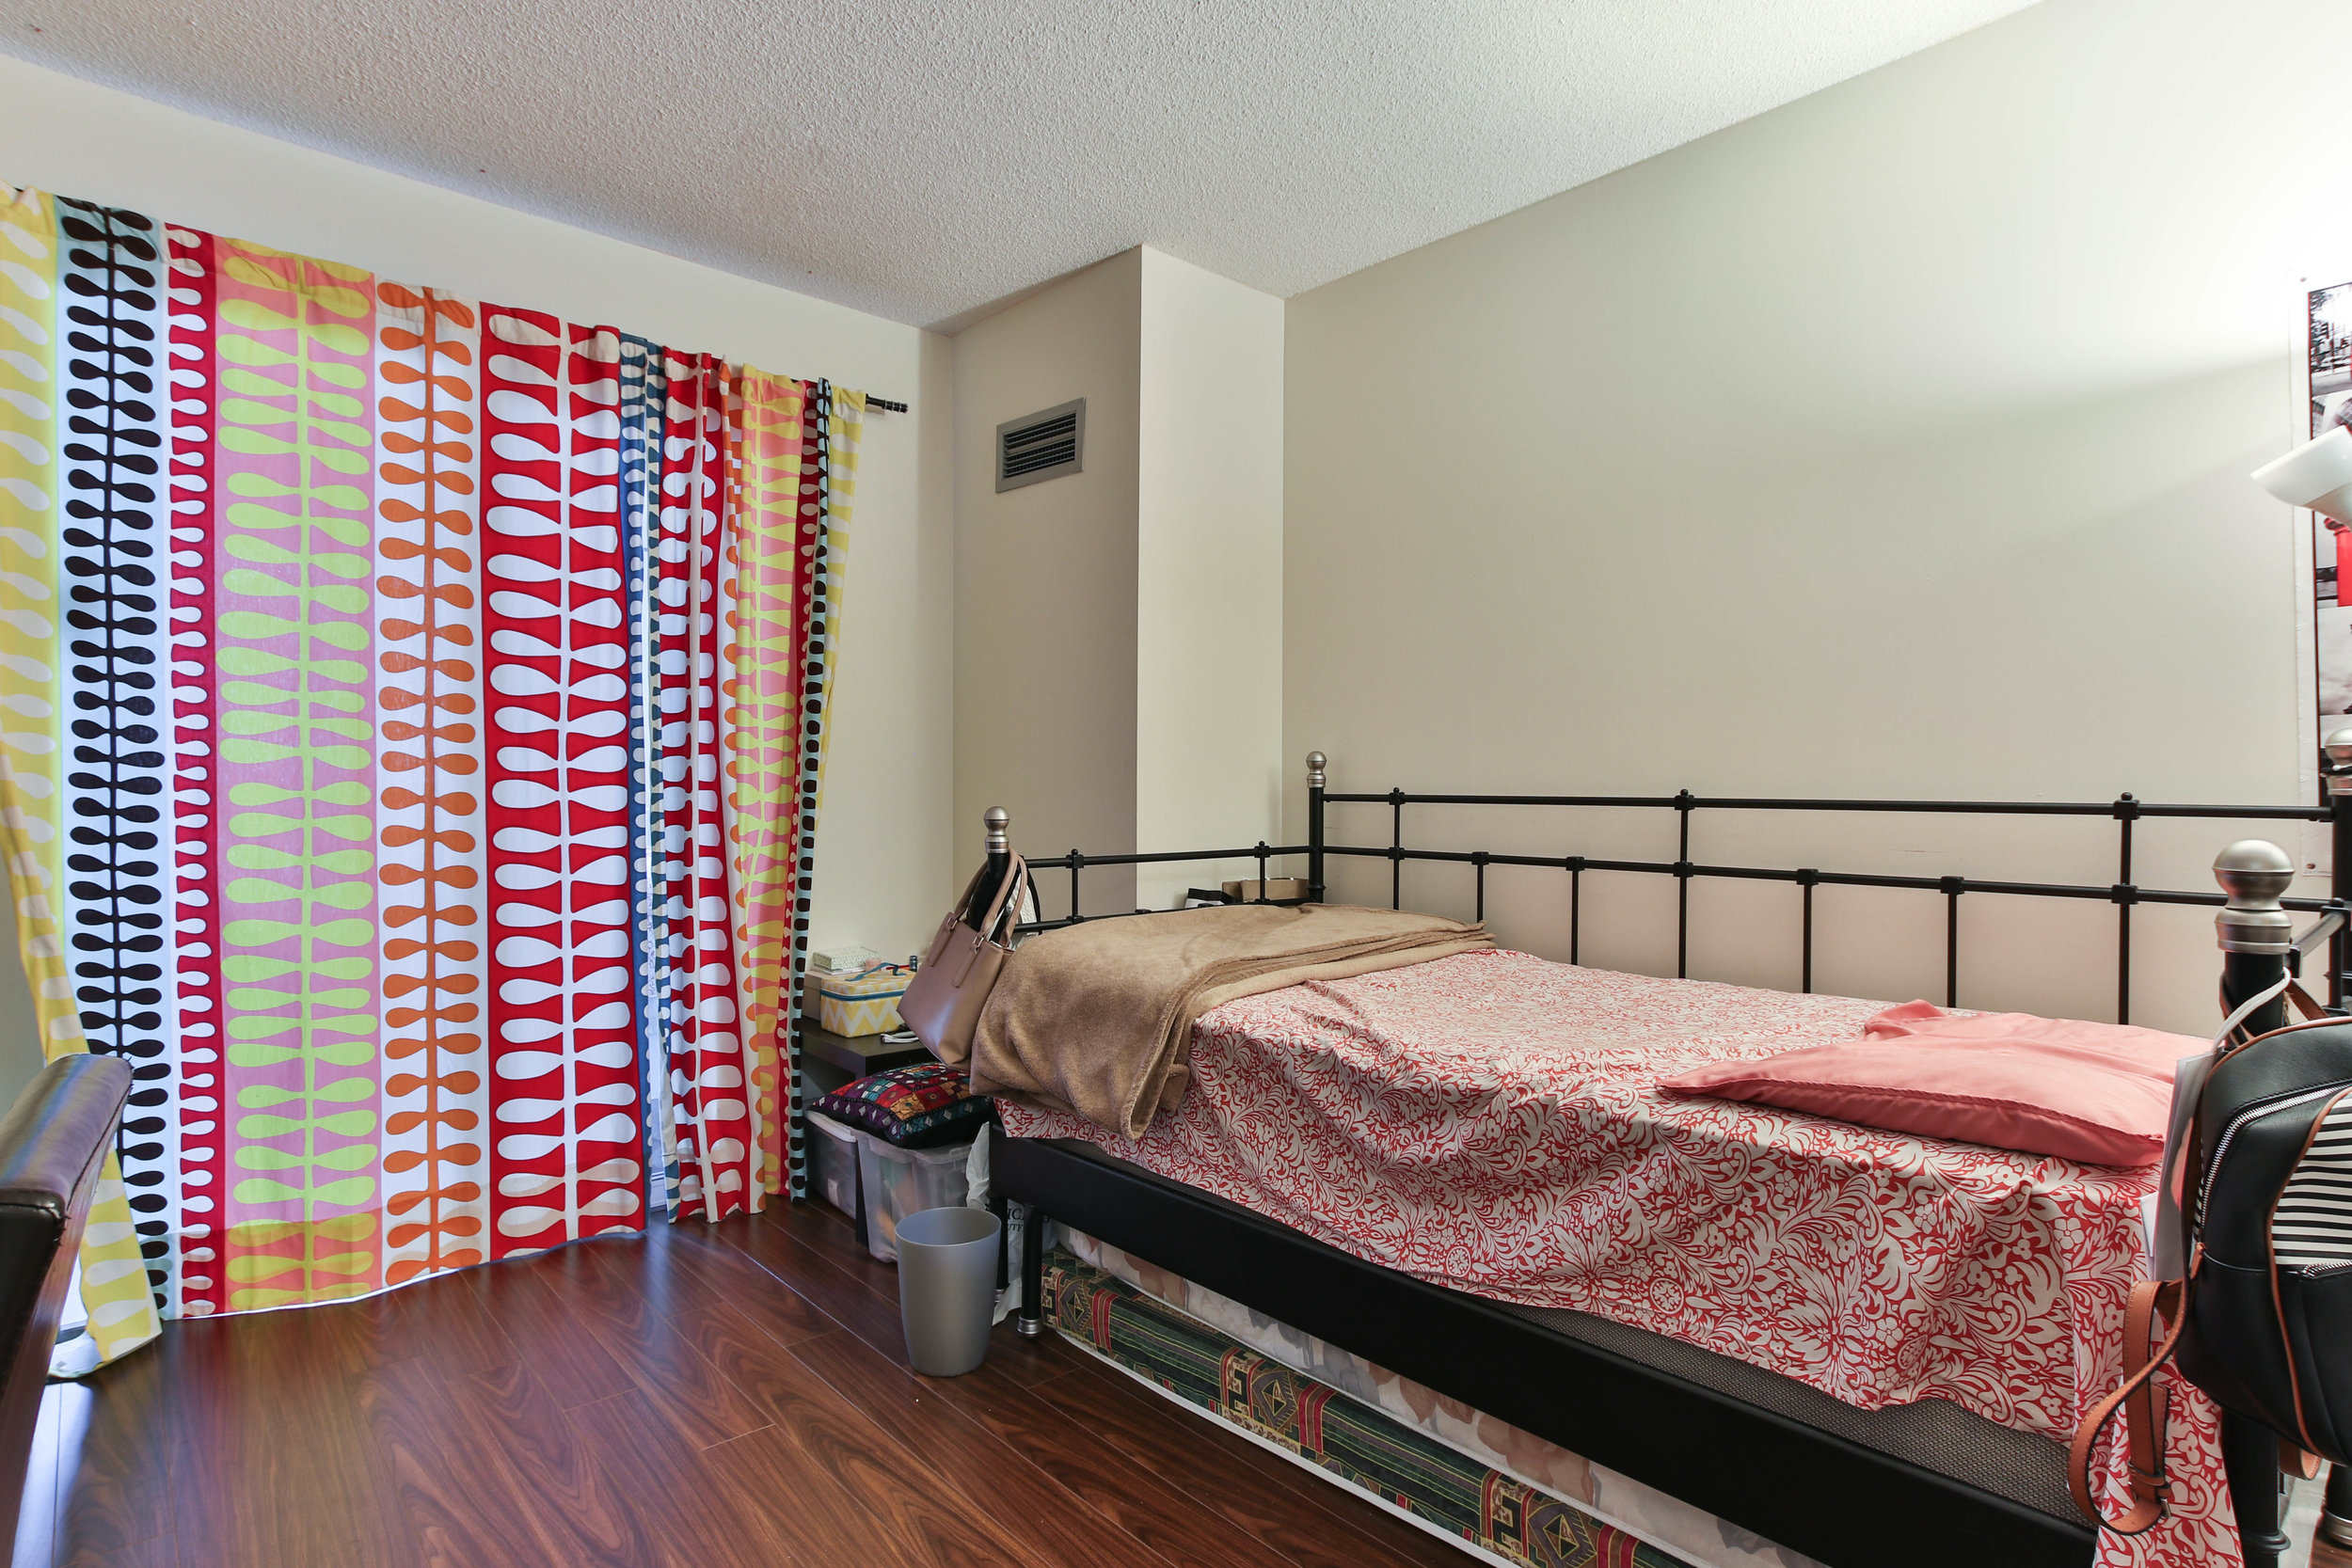 16_Bedroom-3288.jpg